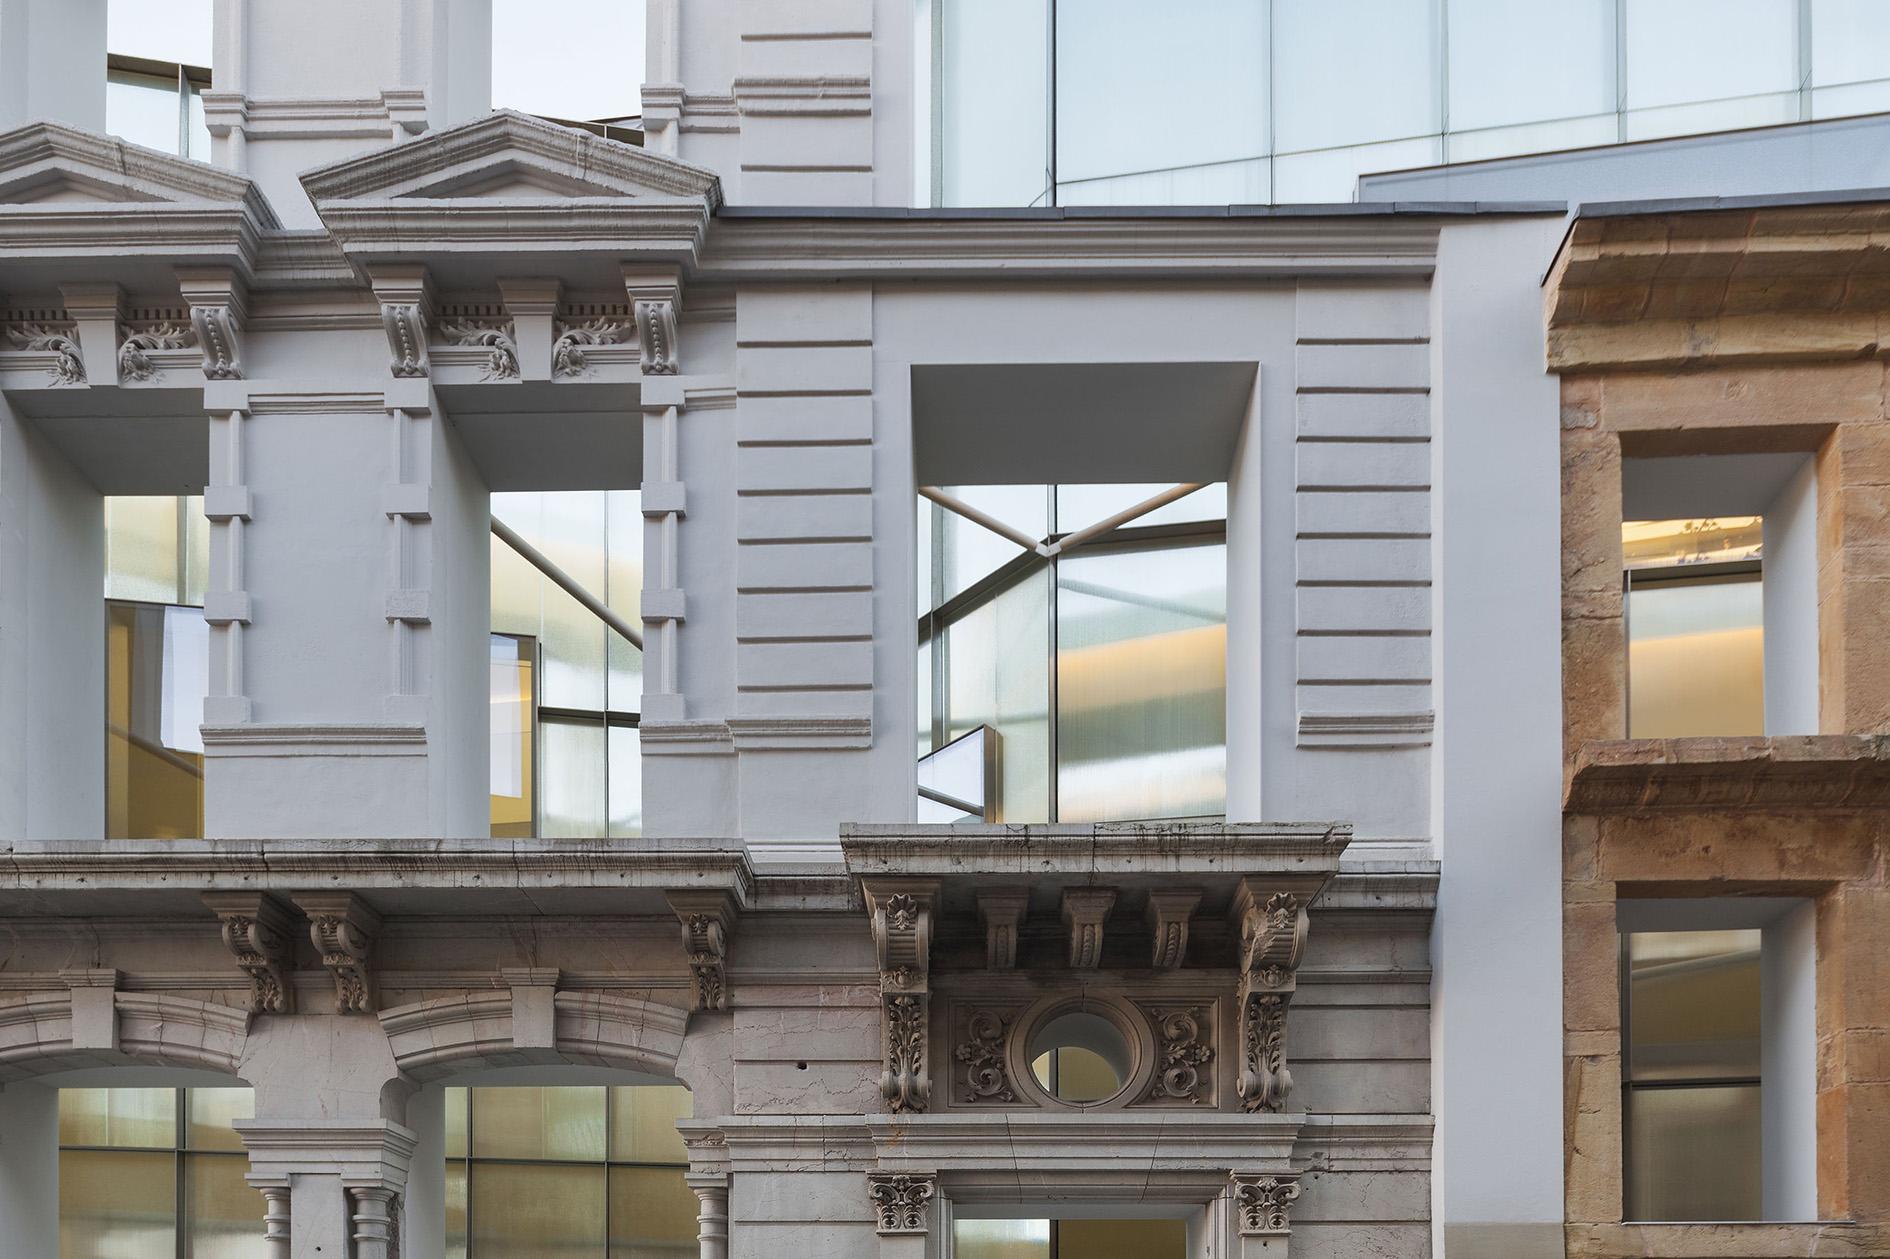 Museo de Bellas Artes de Asturias. Oviedo, 2006–2014. Foto: Pedro Pegenaute